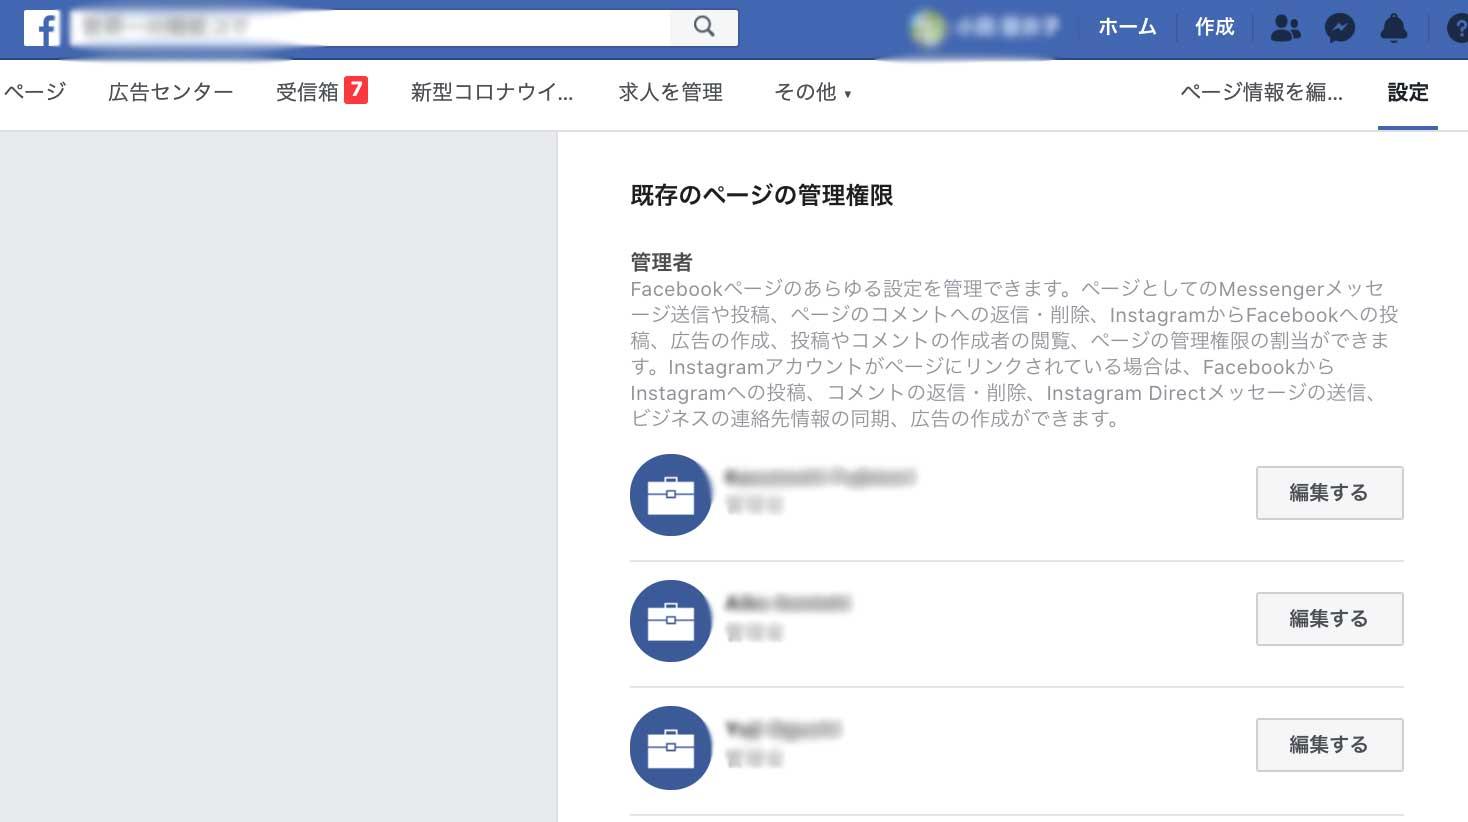 FBページの管理者から削除